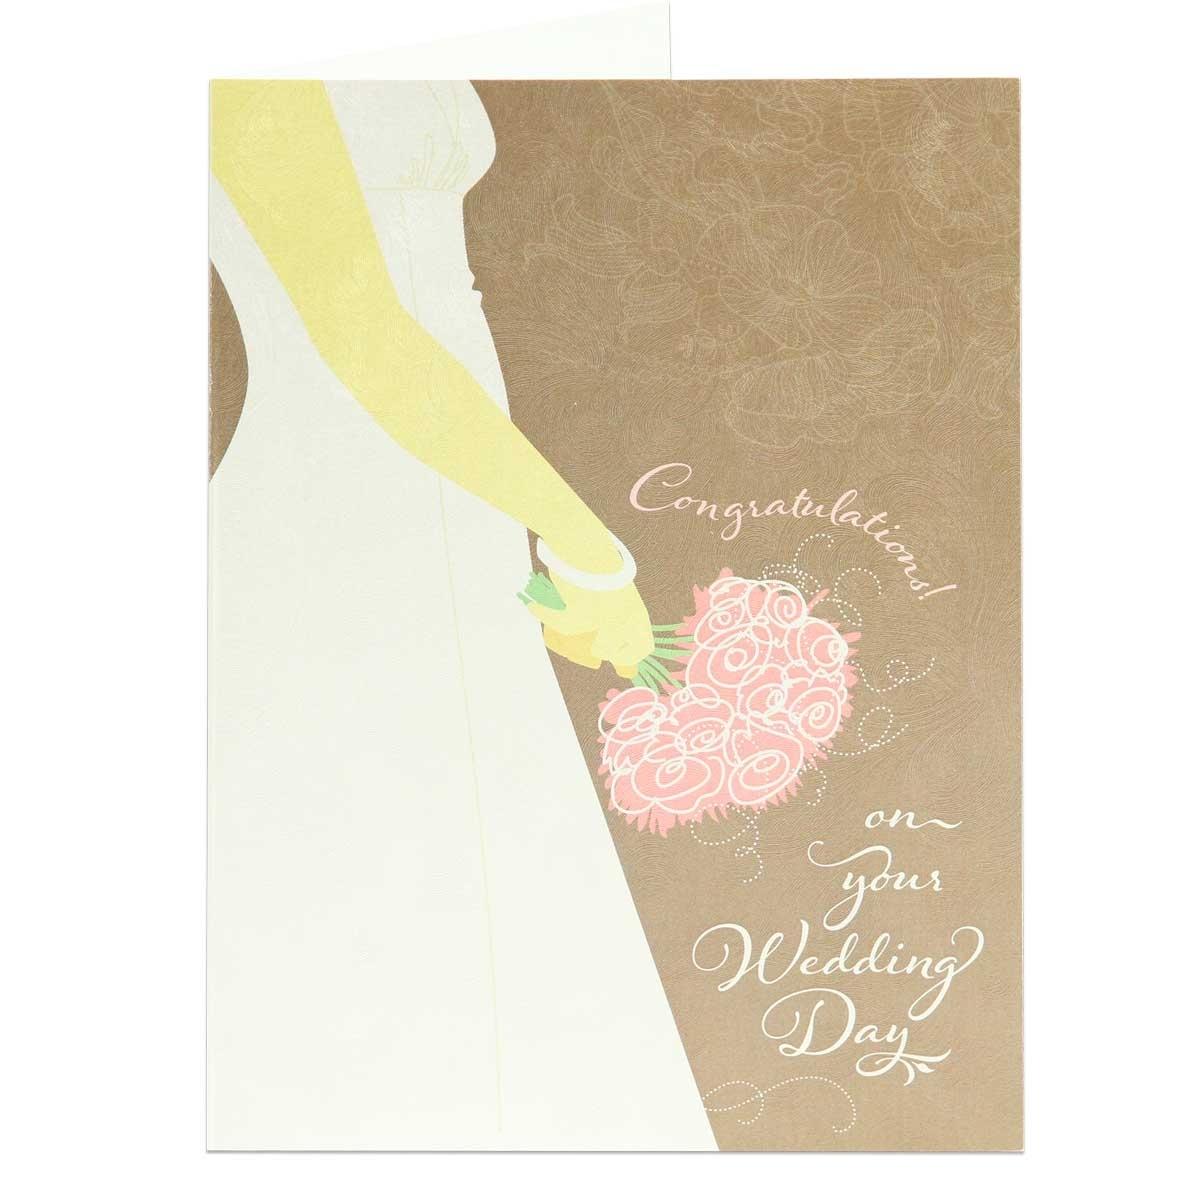 Biblical Wedding Congratulations Card Based On Matthew 195 6